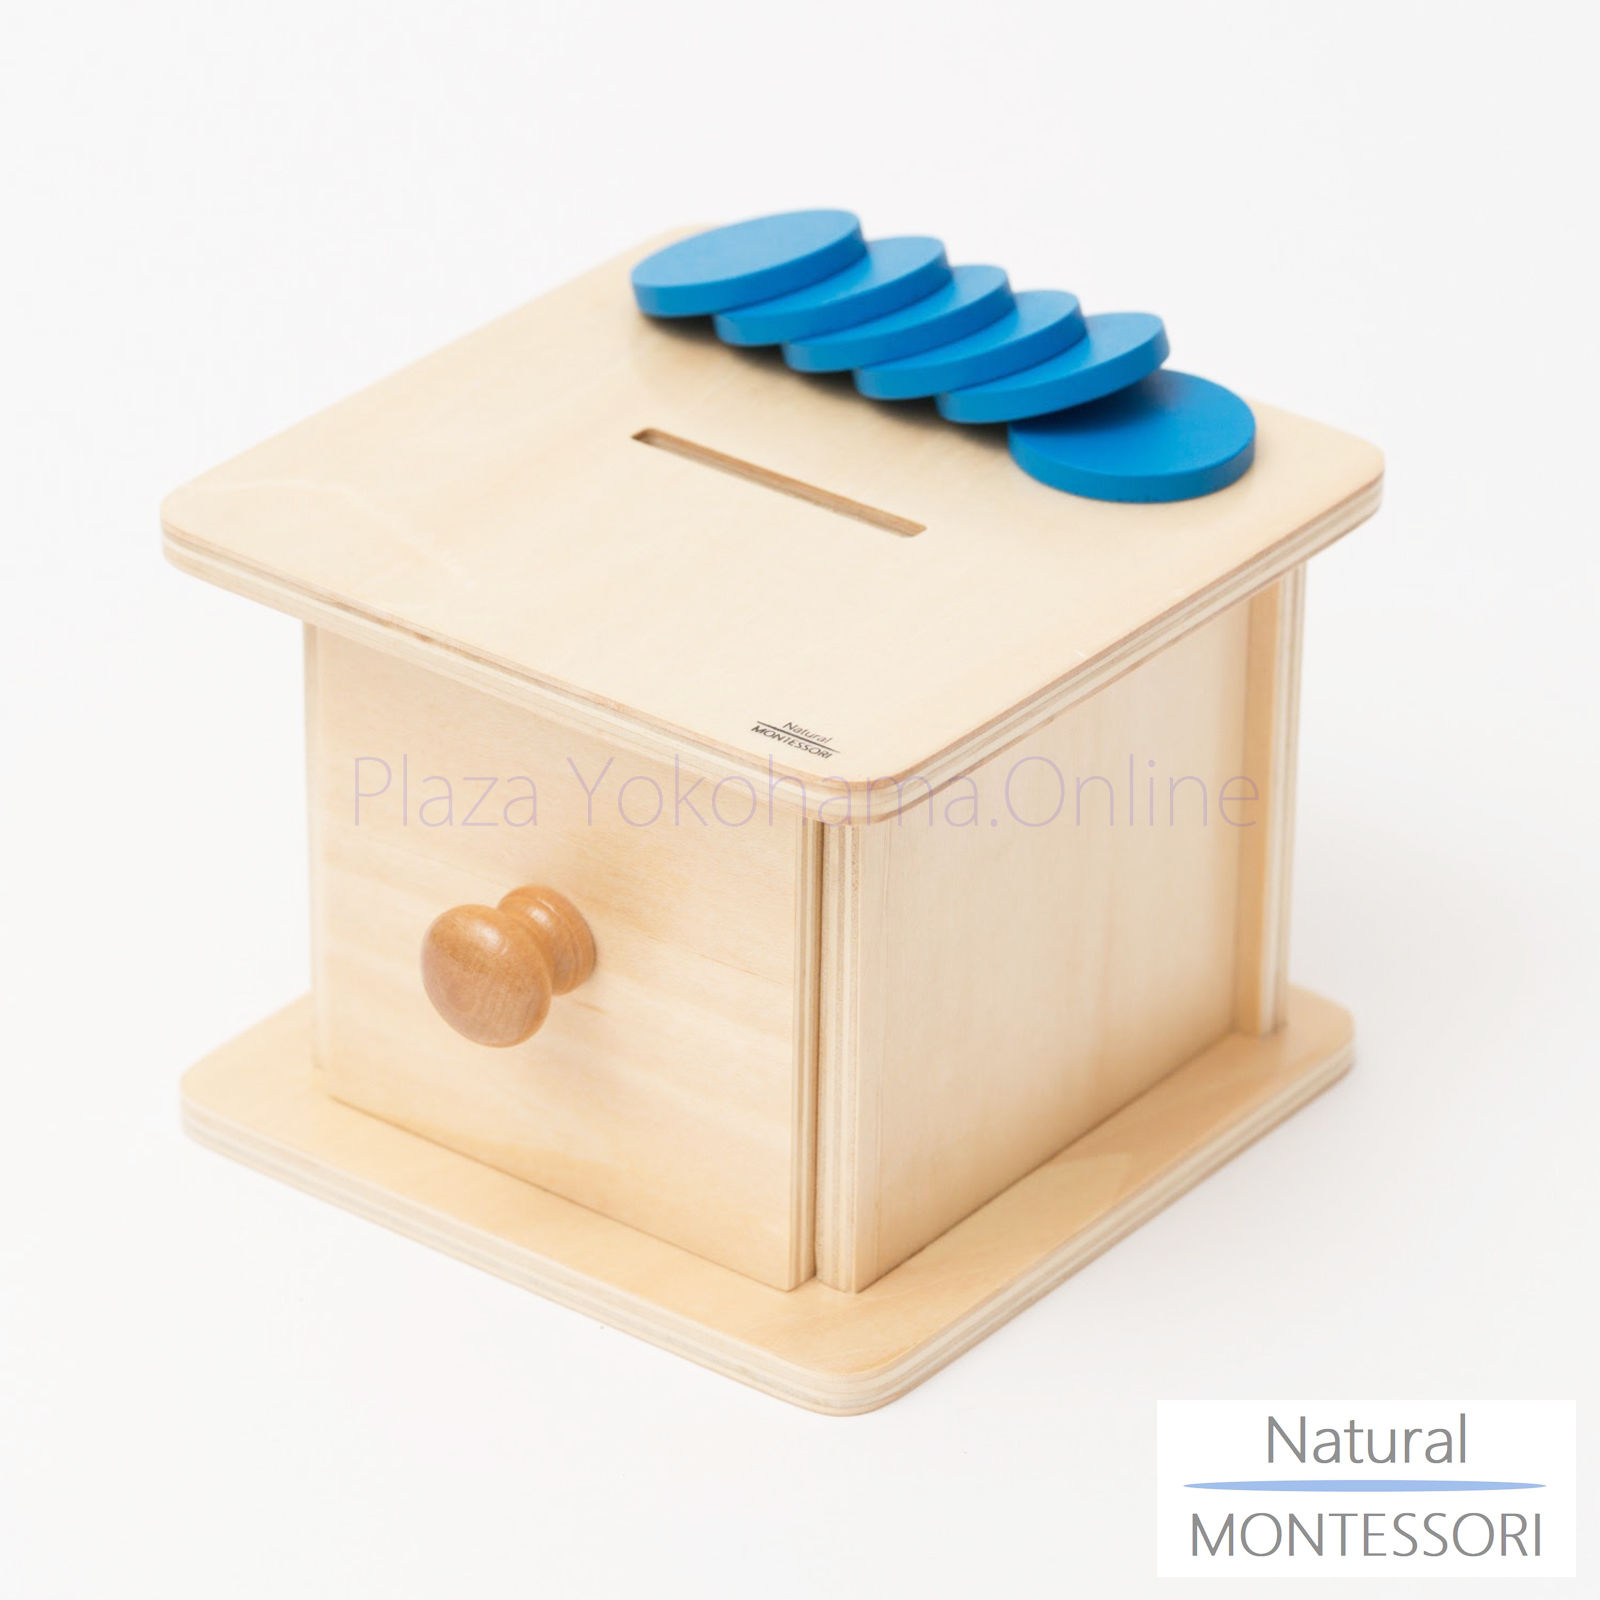 【Natural MONTESSORI】NM-B010 引き出し付きコイン落とし  ≪OUTLET≫